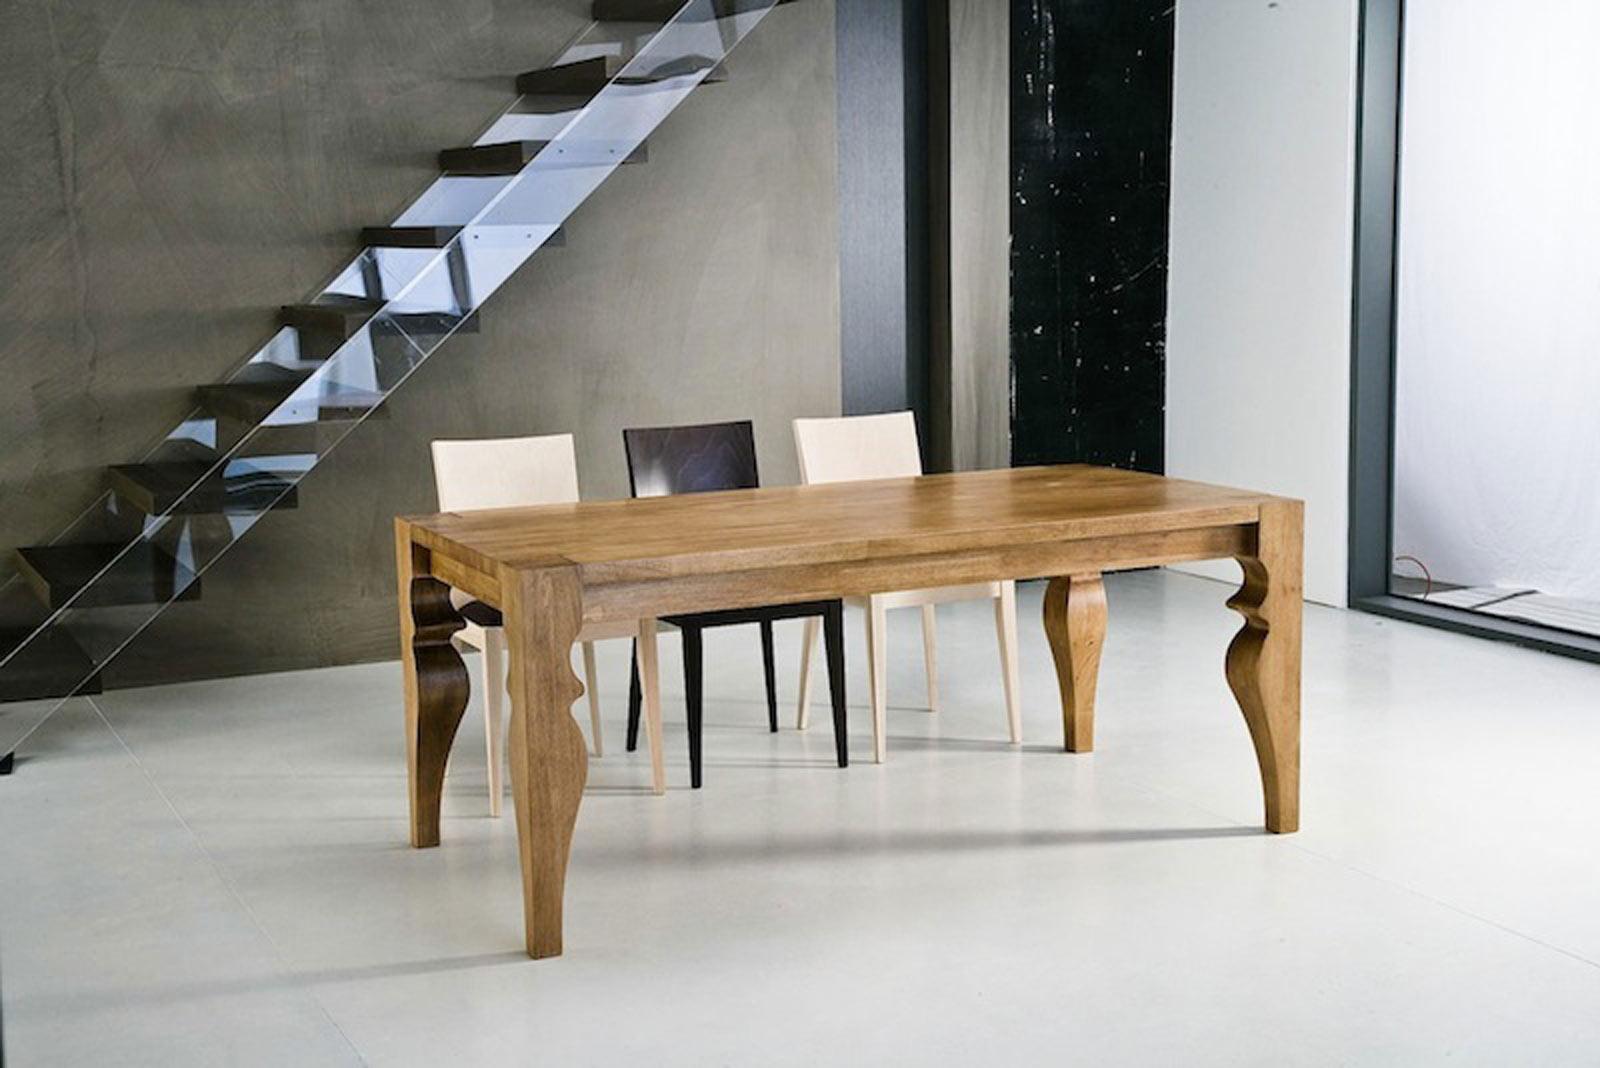 Tavoli e sedie for Sedie tavolo pranzo